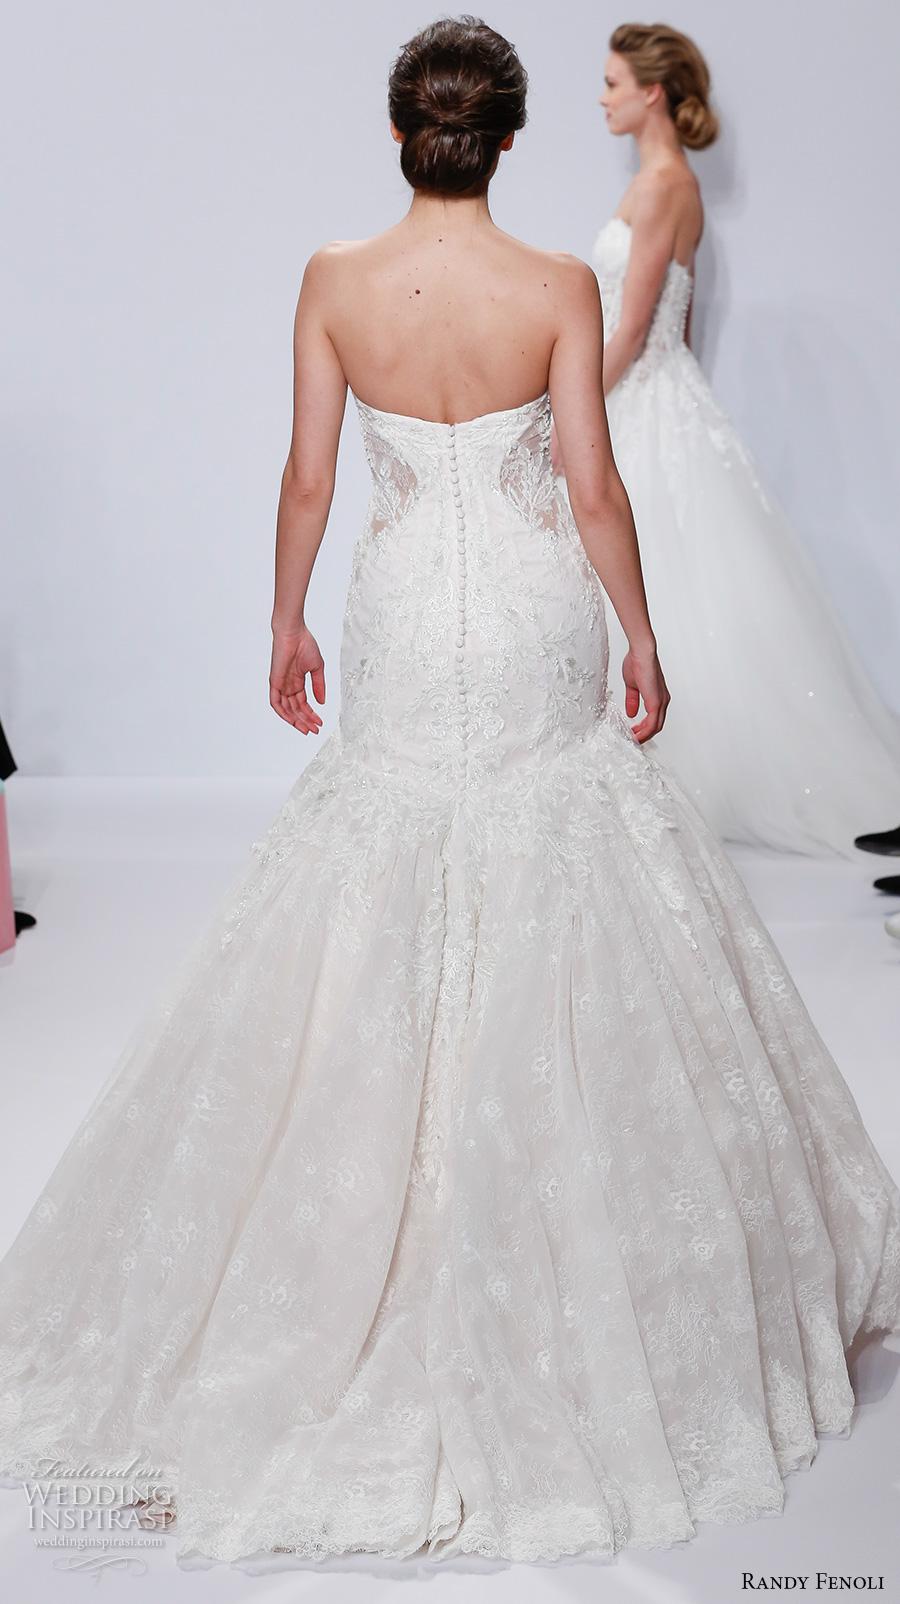 randy fenoli spring 2018 bridal strapless deep plunging sweetheart neckline heavily embellished bodice princess trumpet wedding dress chapel train (18) bv